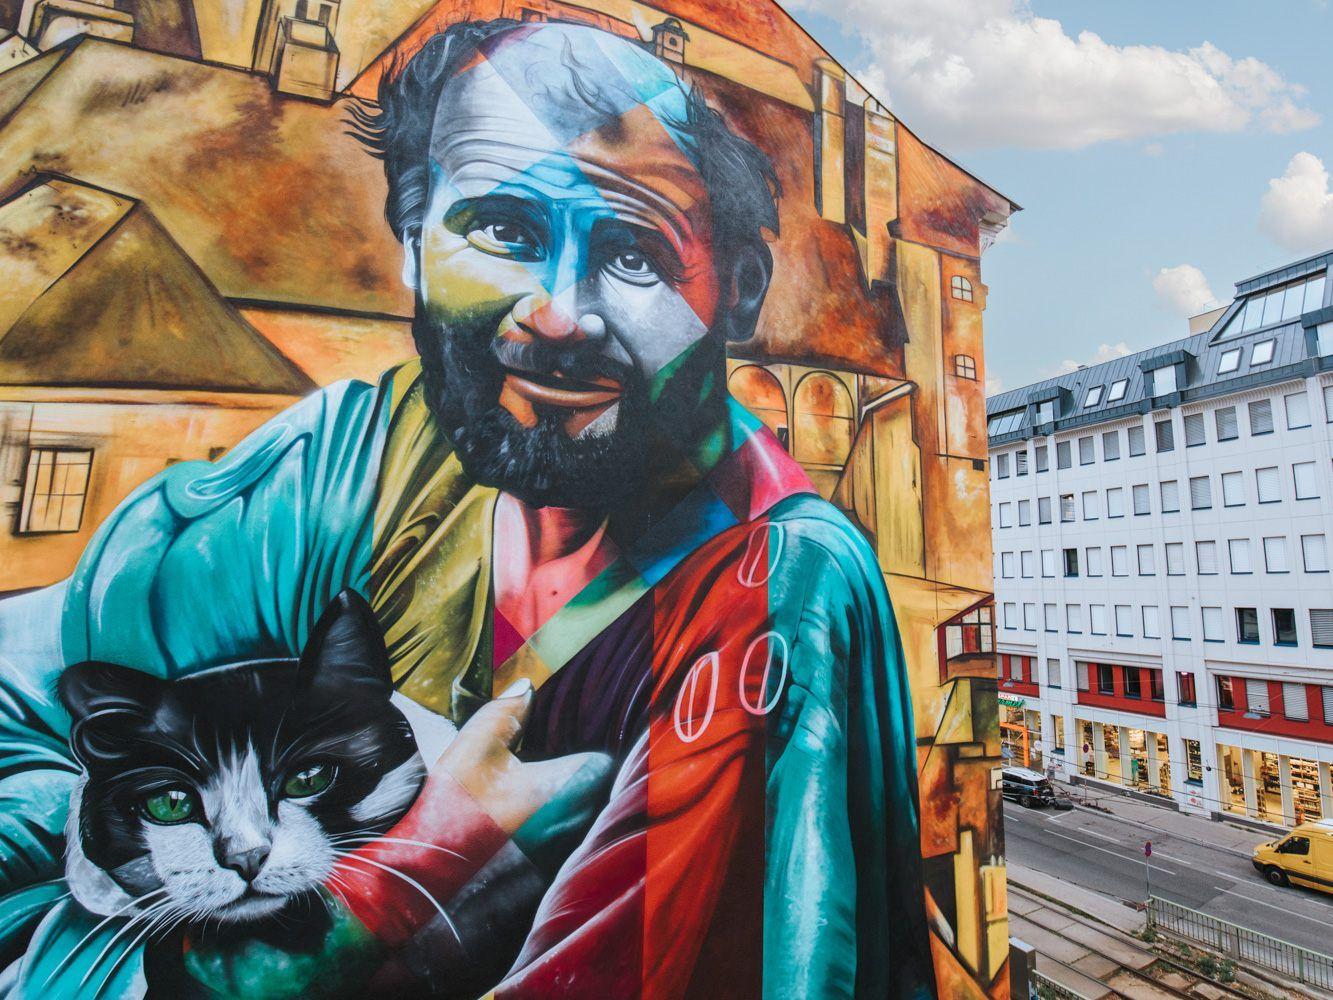 Großartige Kunstwerke beim Calle Libre in Wien. ae2ab0afcb1